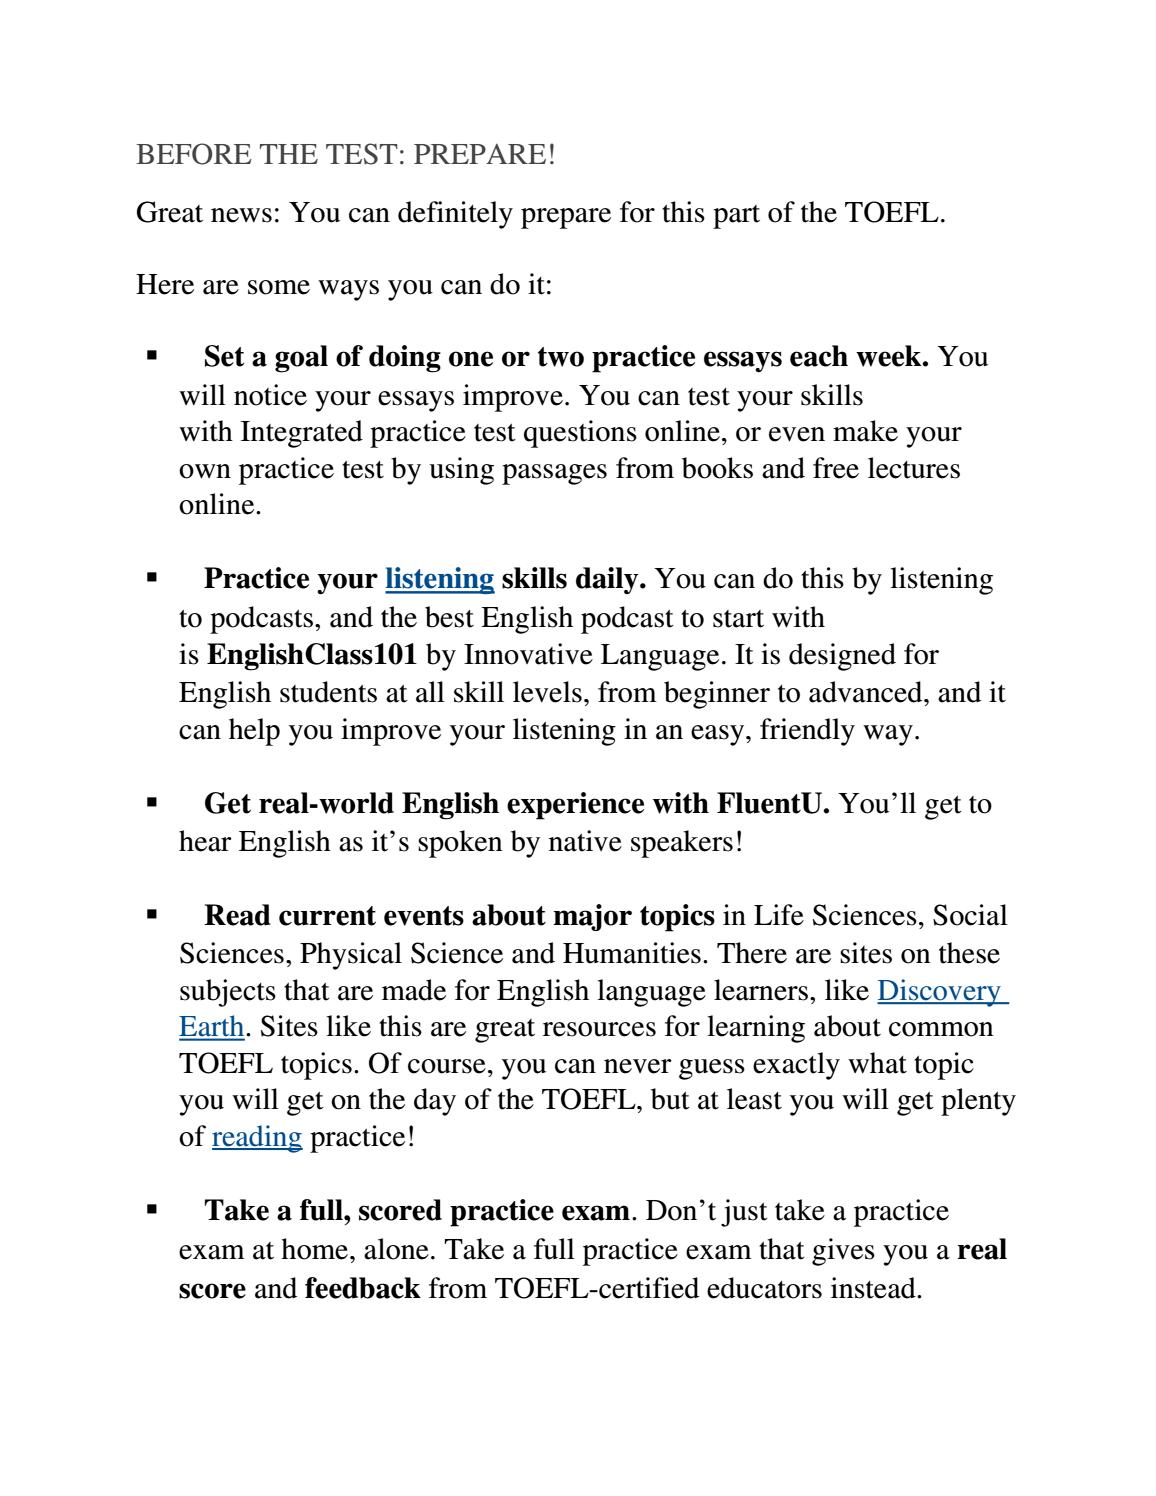 020 Page 1 Essay Toefl Topics ~ Thatsnotus